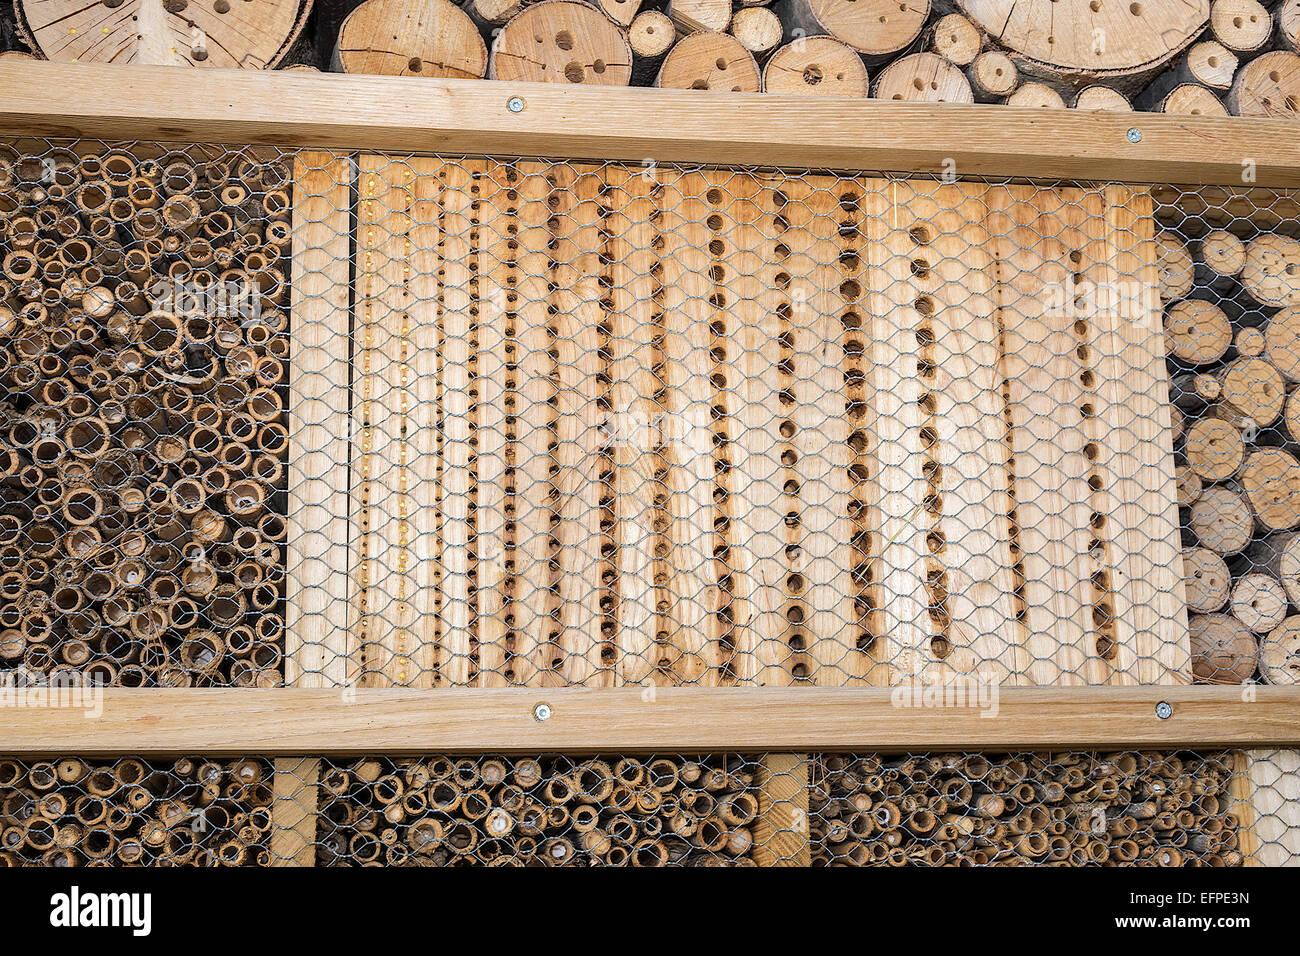 Leaf Cutter Bee Hives (megachilids) Monte Carlo Monaco - Stock Image